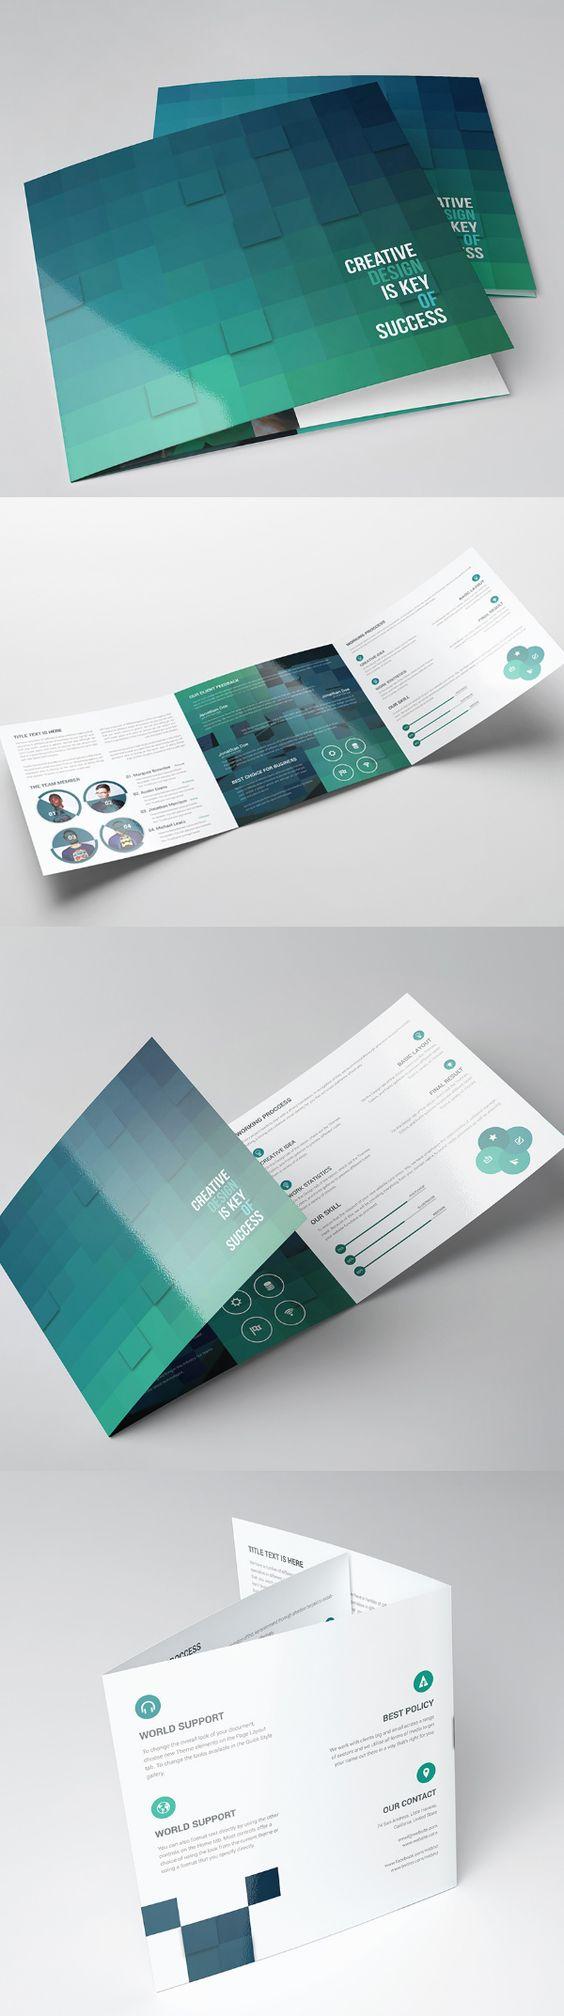 Square Tri-fold Brochure Template | friday brochure | Pinterest ...